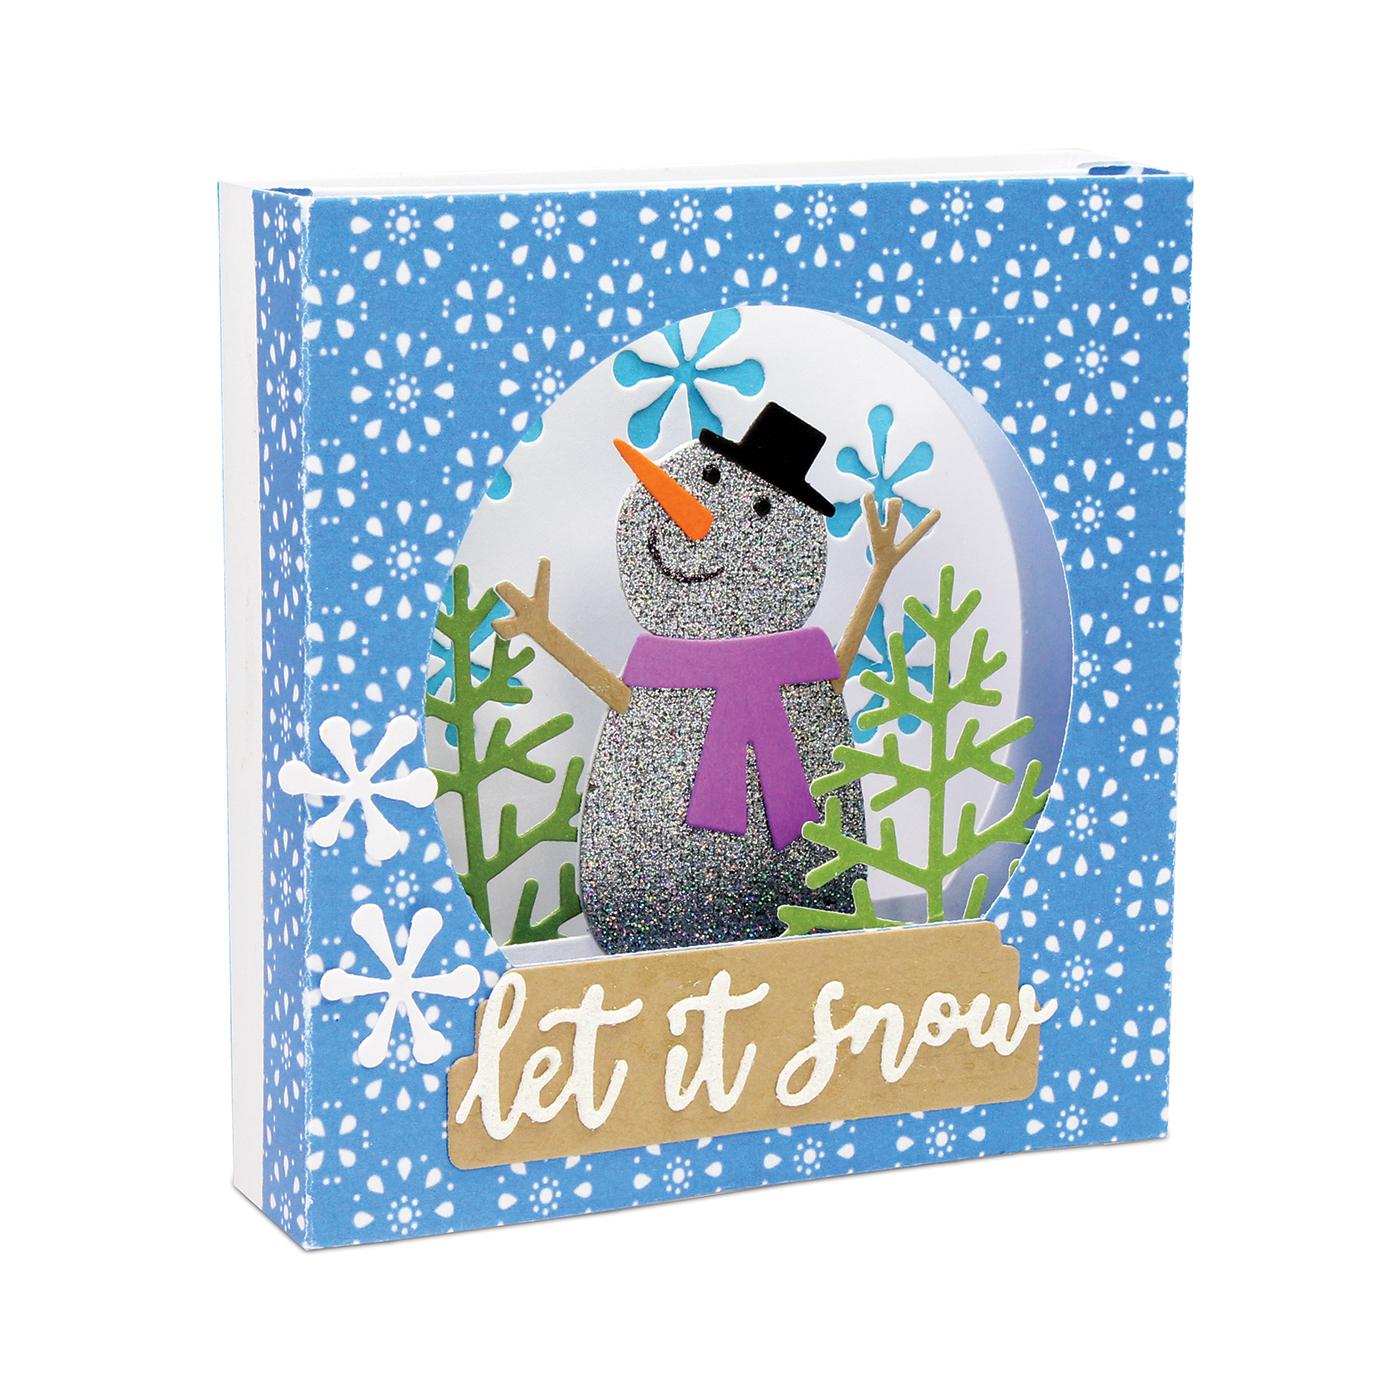 Tunnel Card, Snow Globe